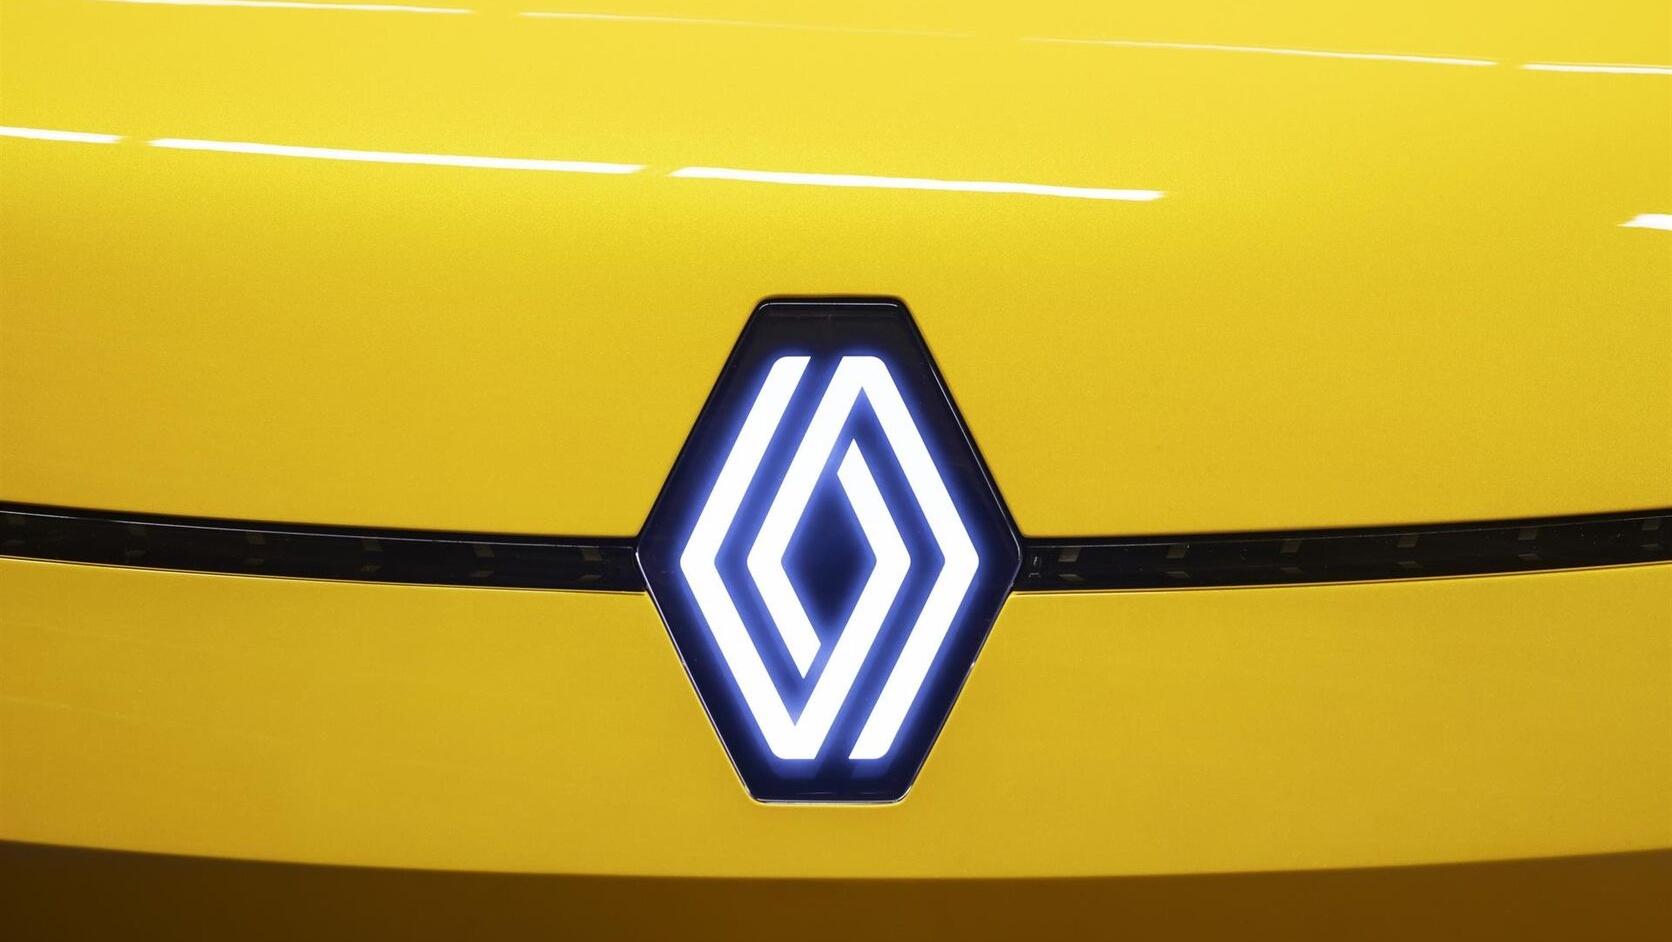 Nueva identidad visual Renault